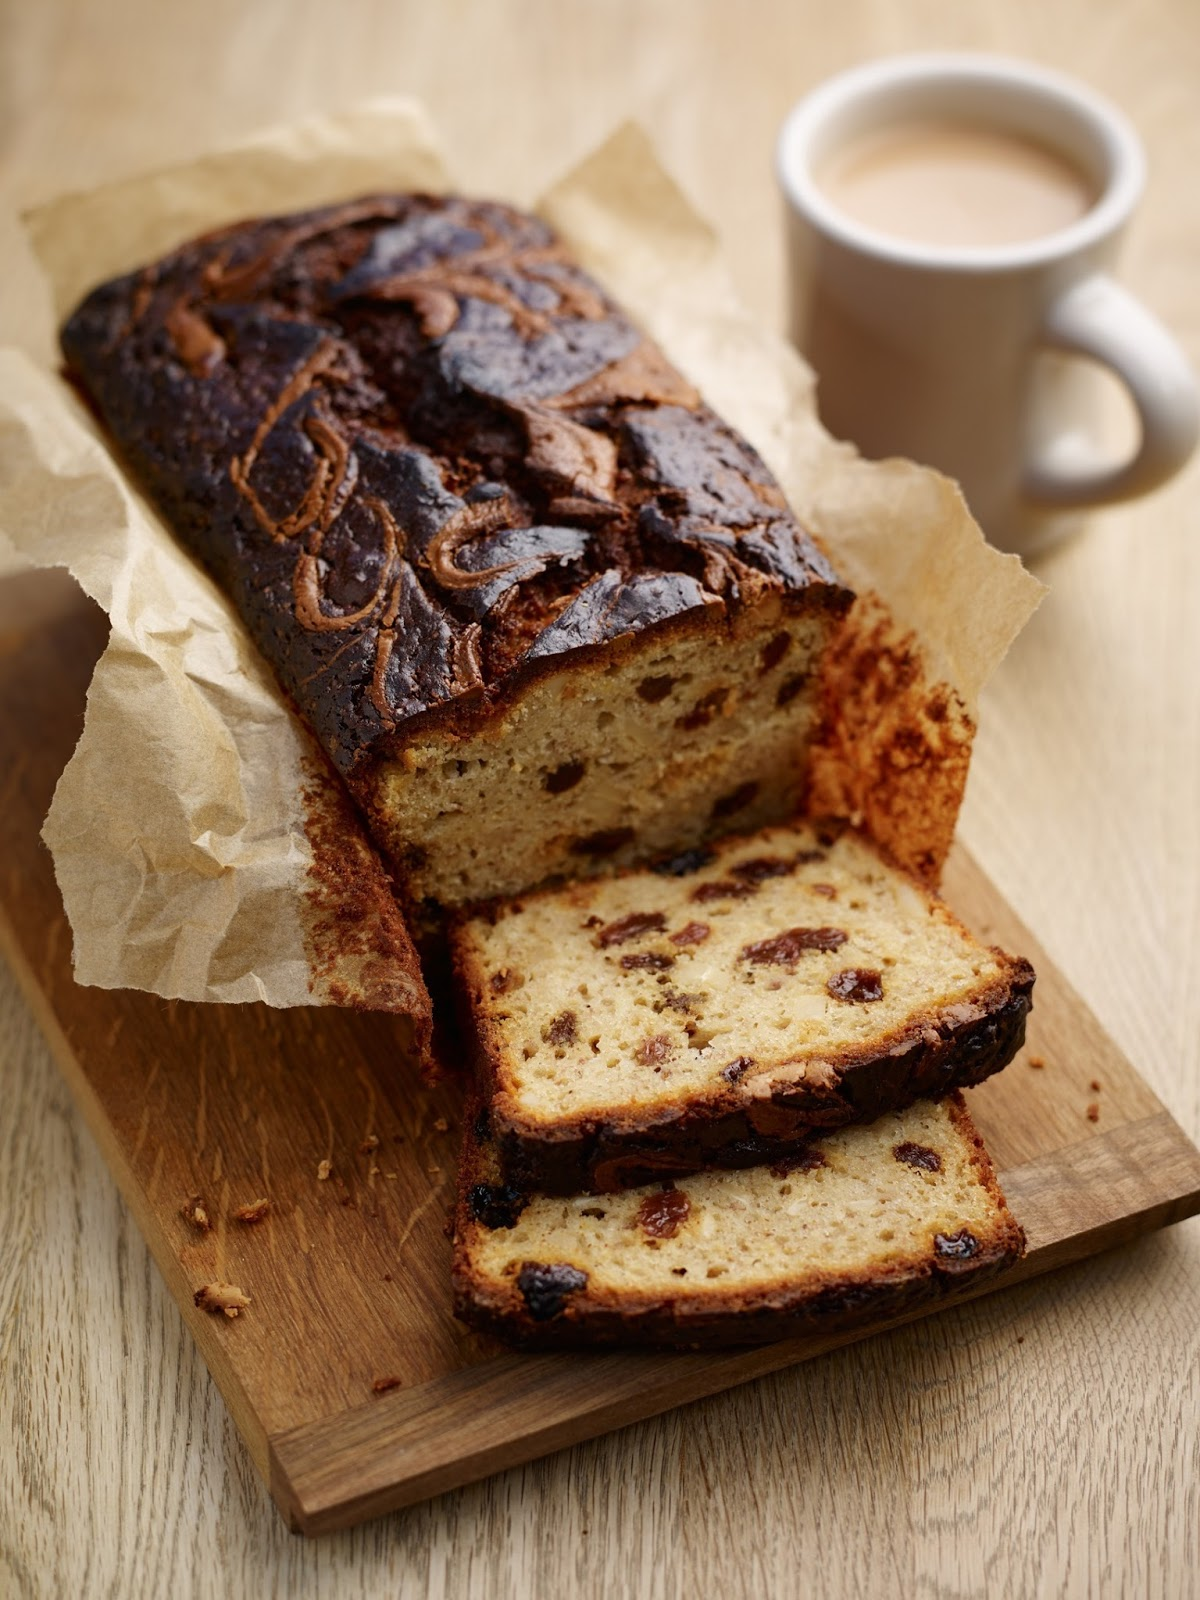 Banana & Cashew Bread - How To Make Some